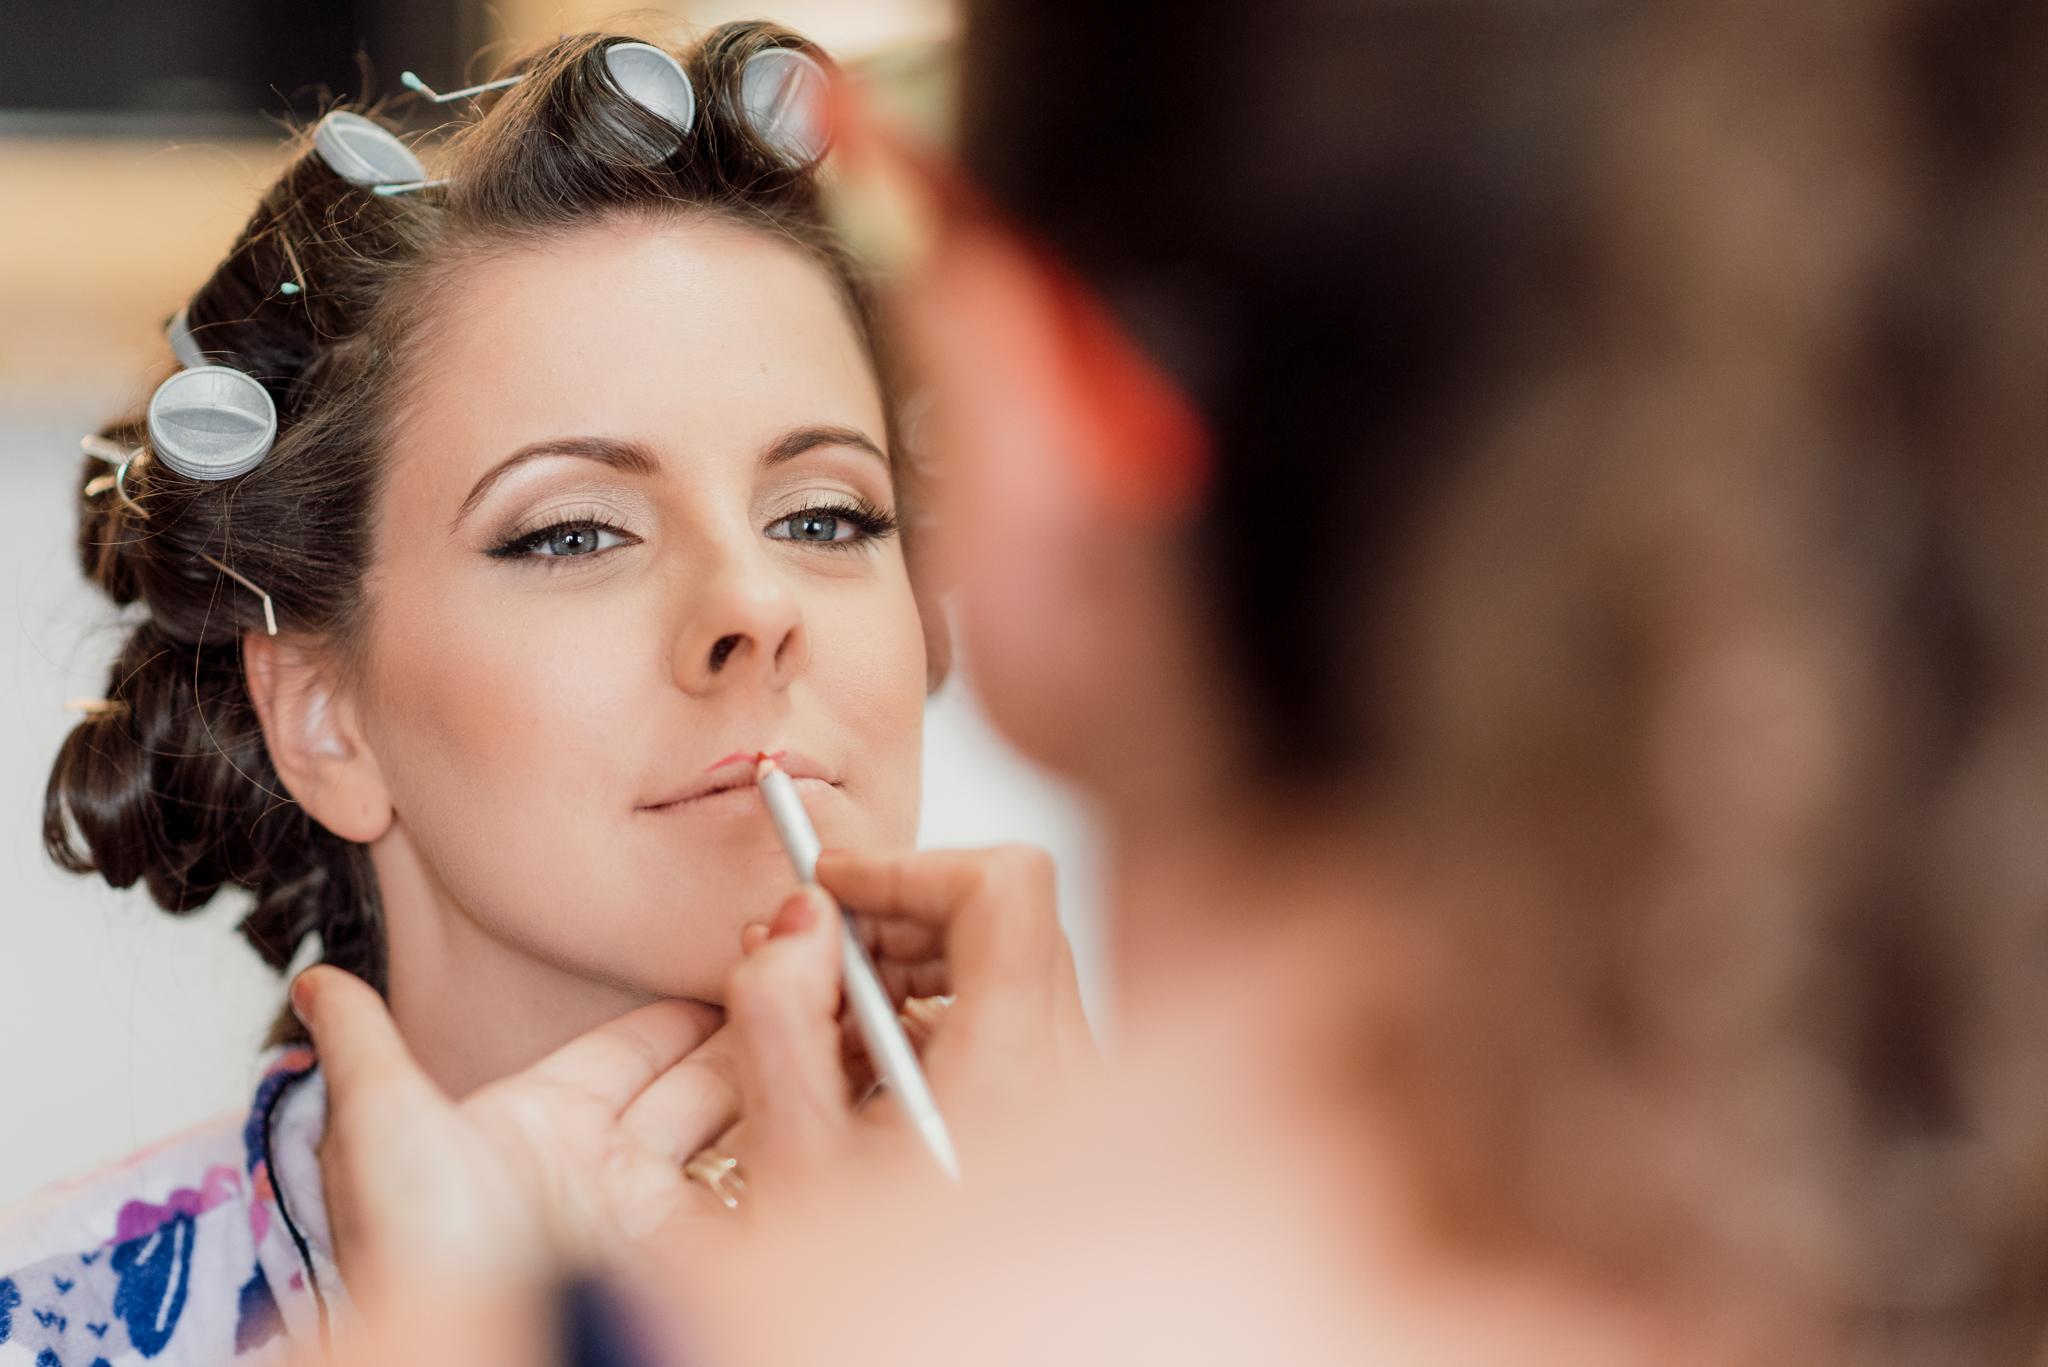 ack Gilchrist Photography Susan Markovic makeup-1.jpg